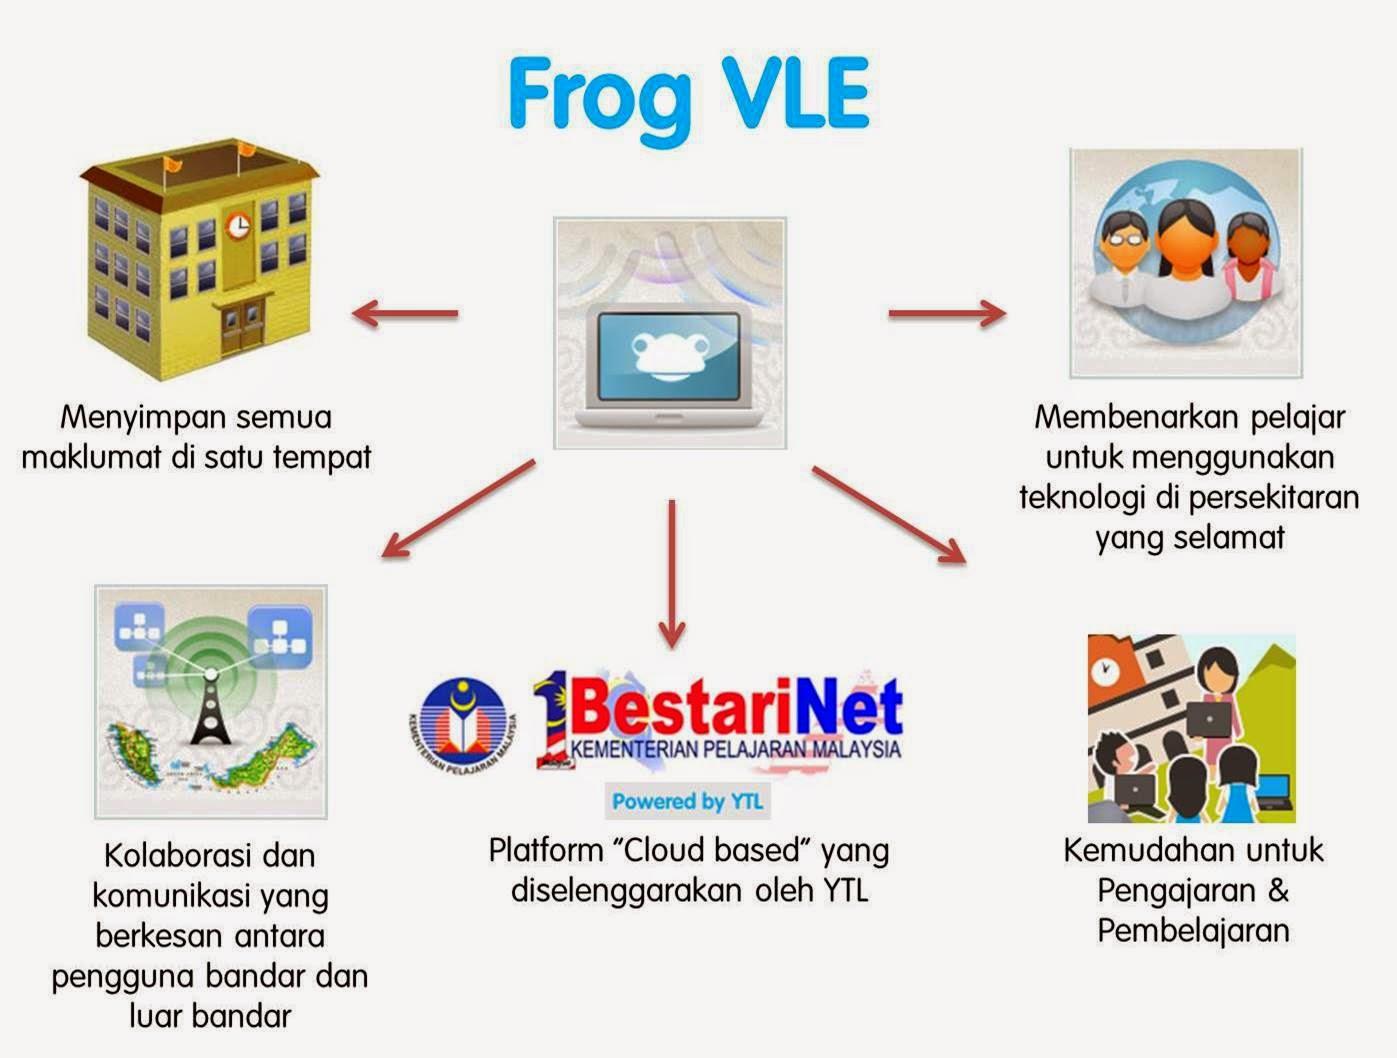 ... frog vle mengikut kpi yang telah ditetapkan login frog vle 30 minit